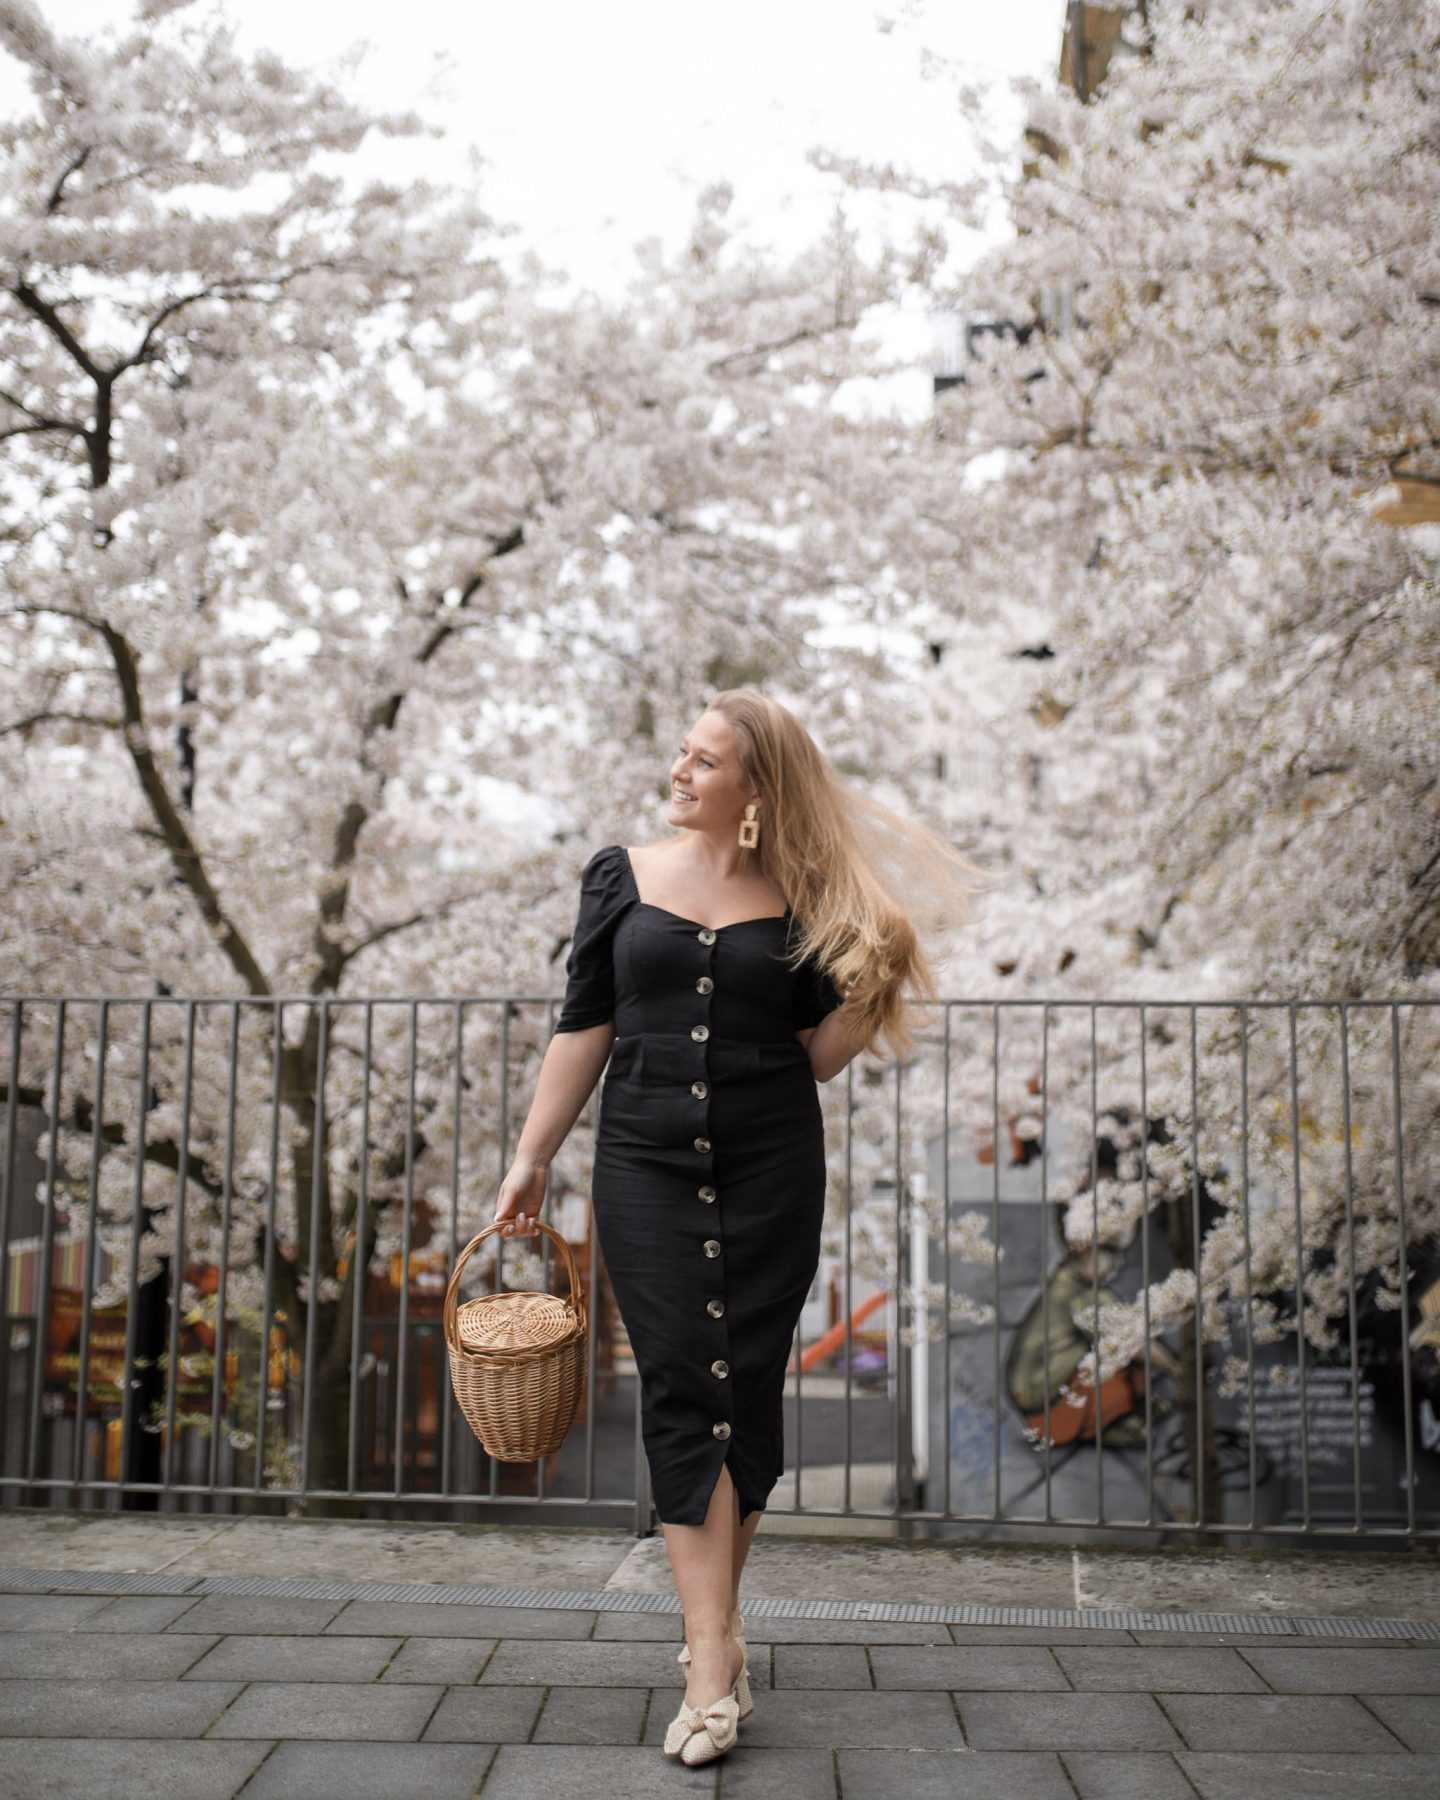 Katie Heath, KALANCHOE Black Cherry Blossom in spring